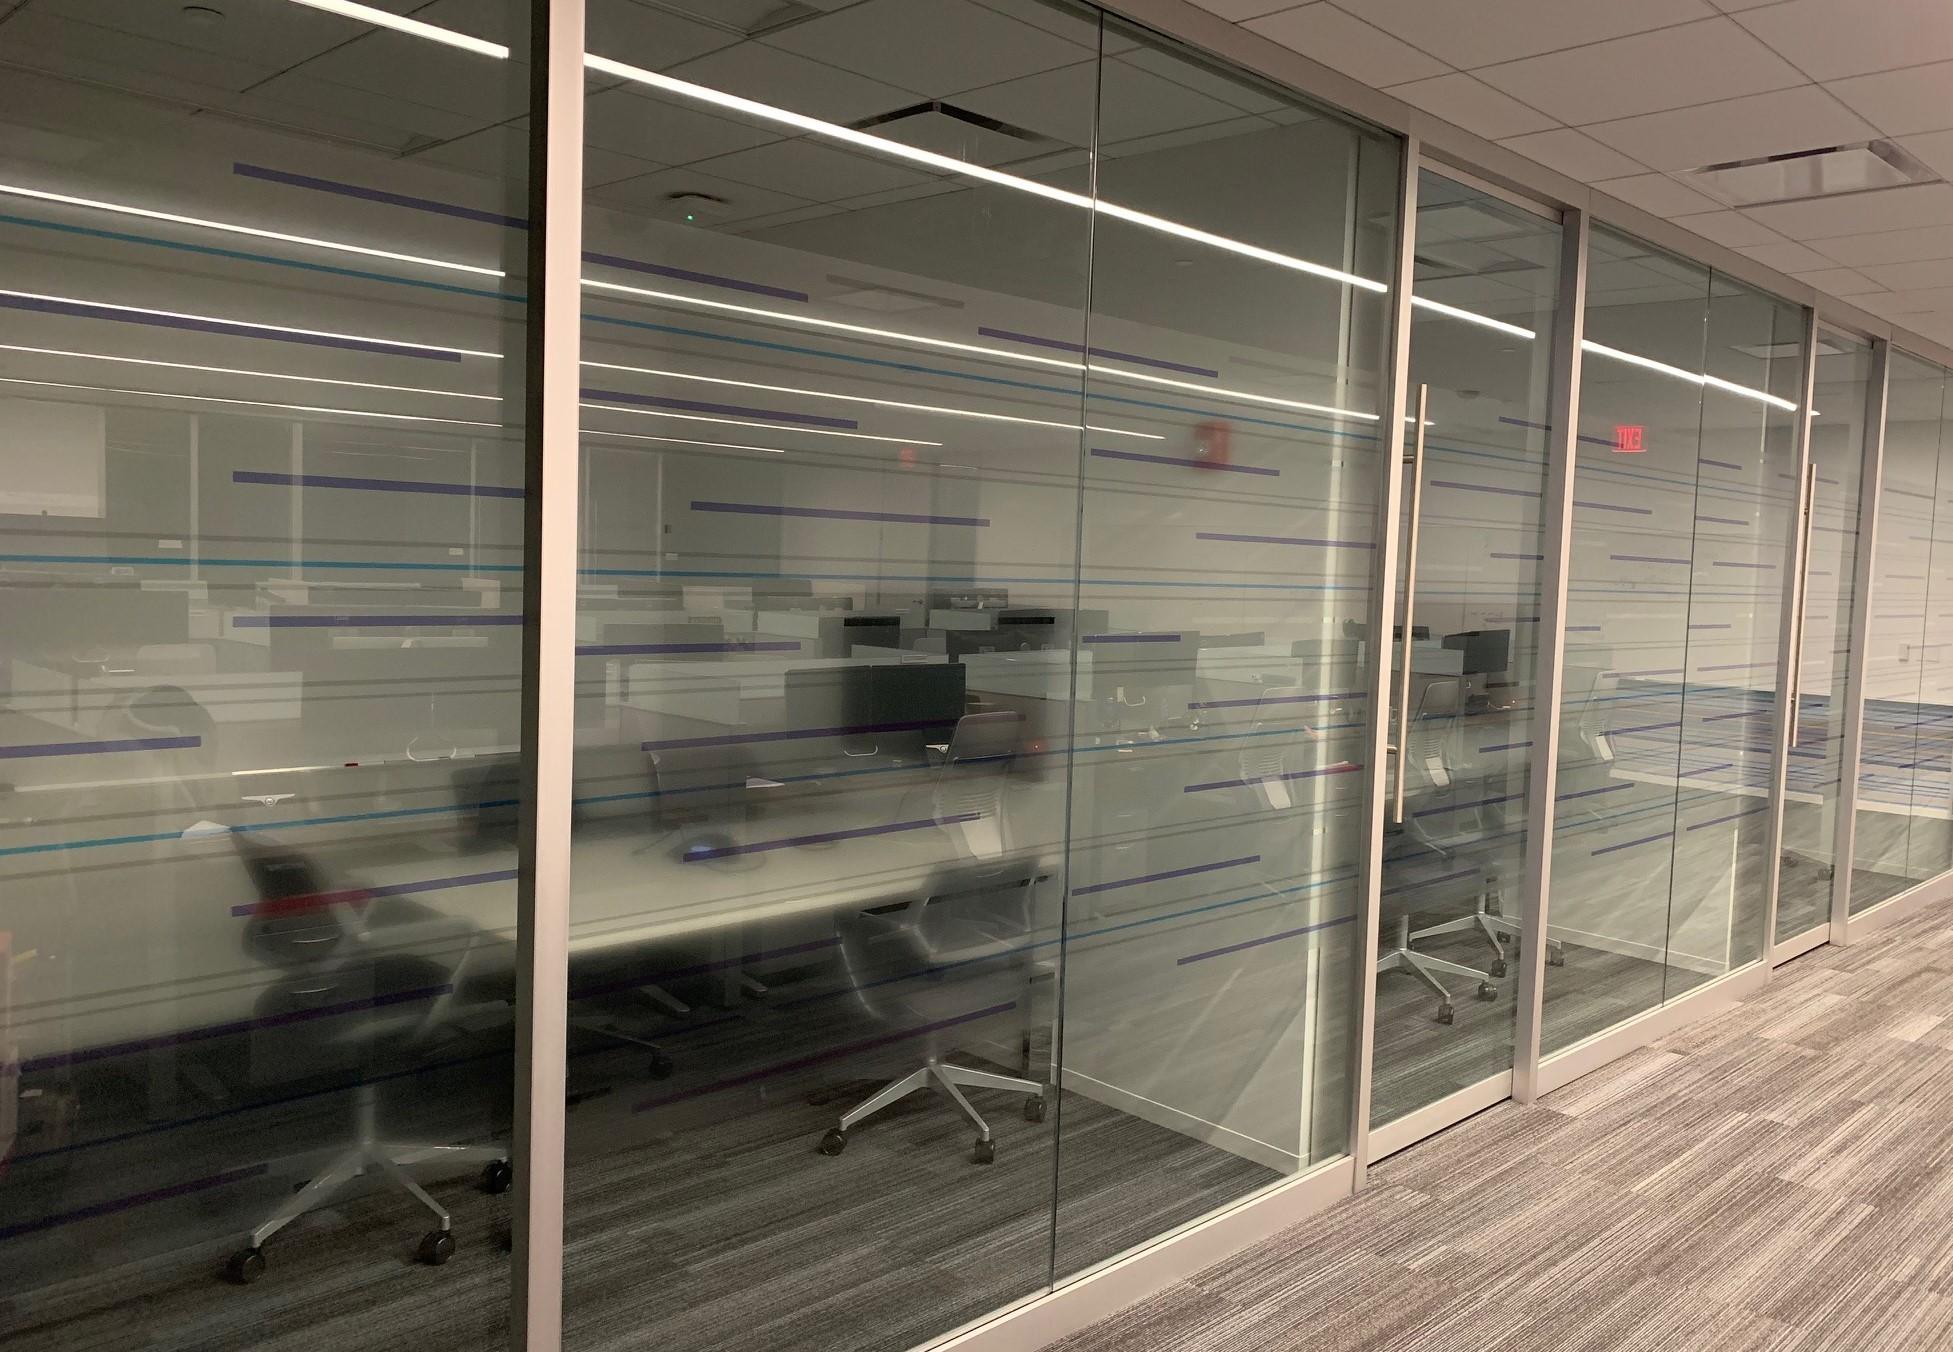 Window graphics on study room doors